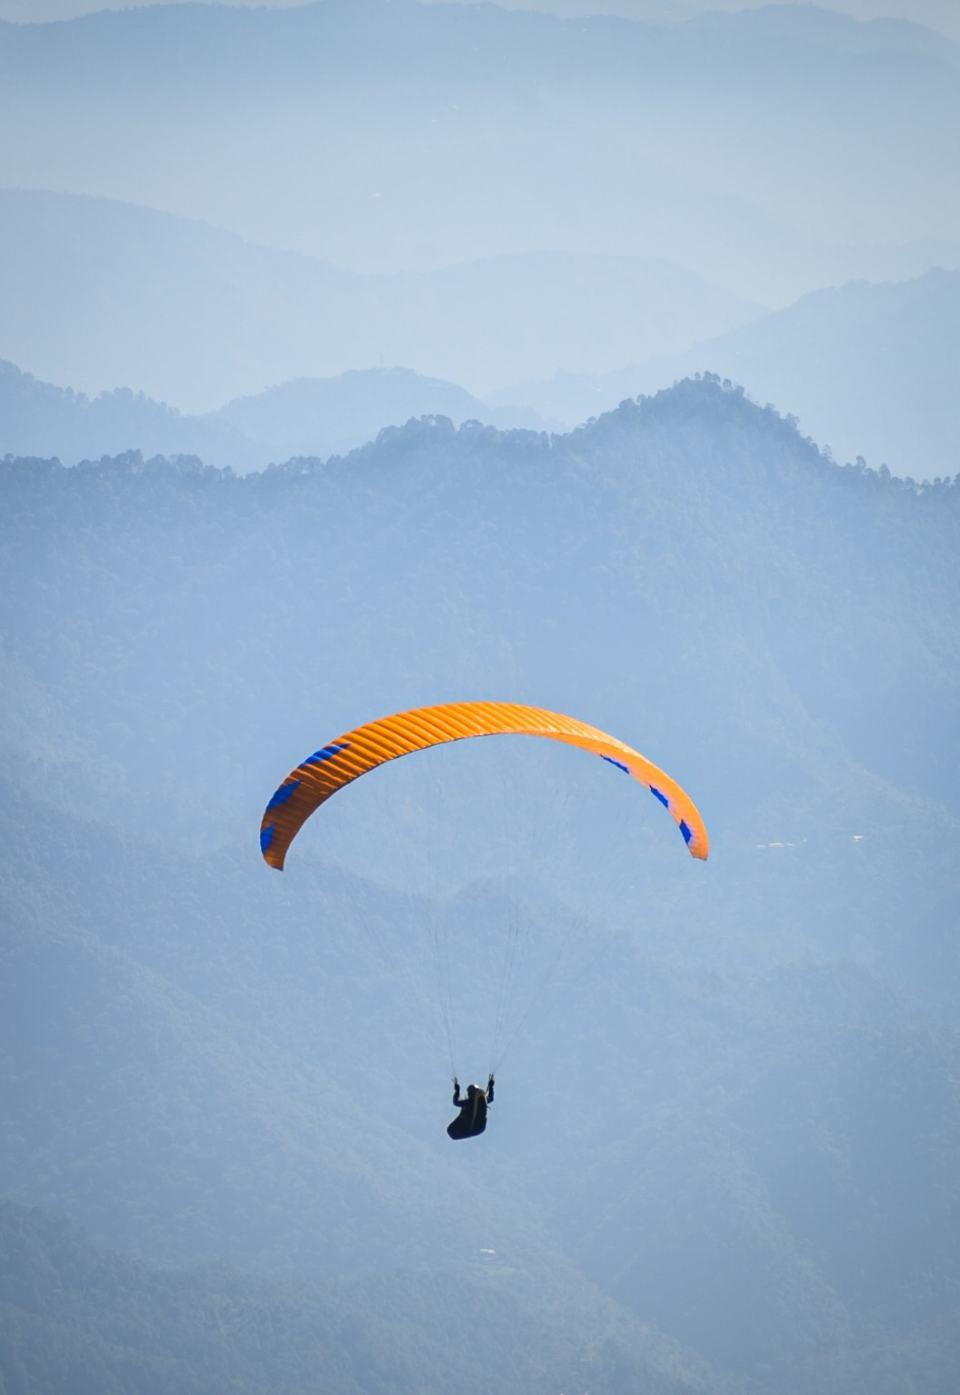 Flying season in Bir Billing